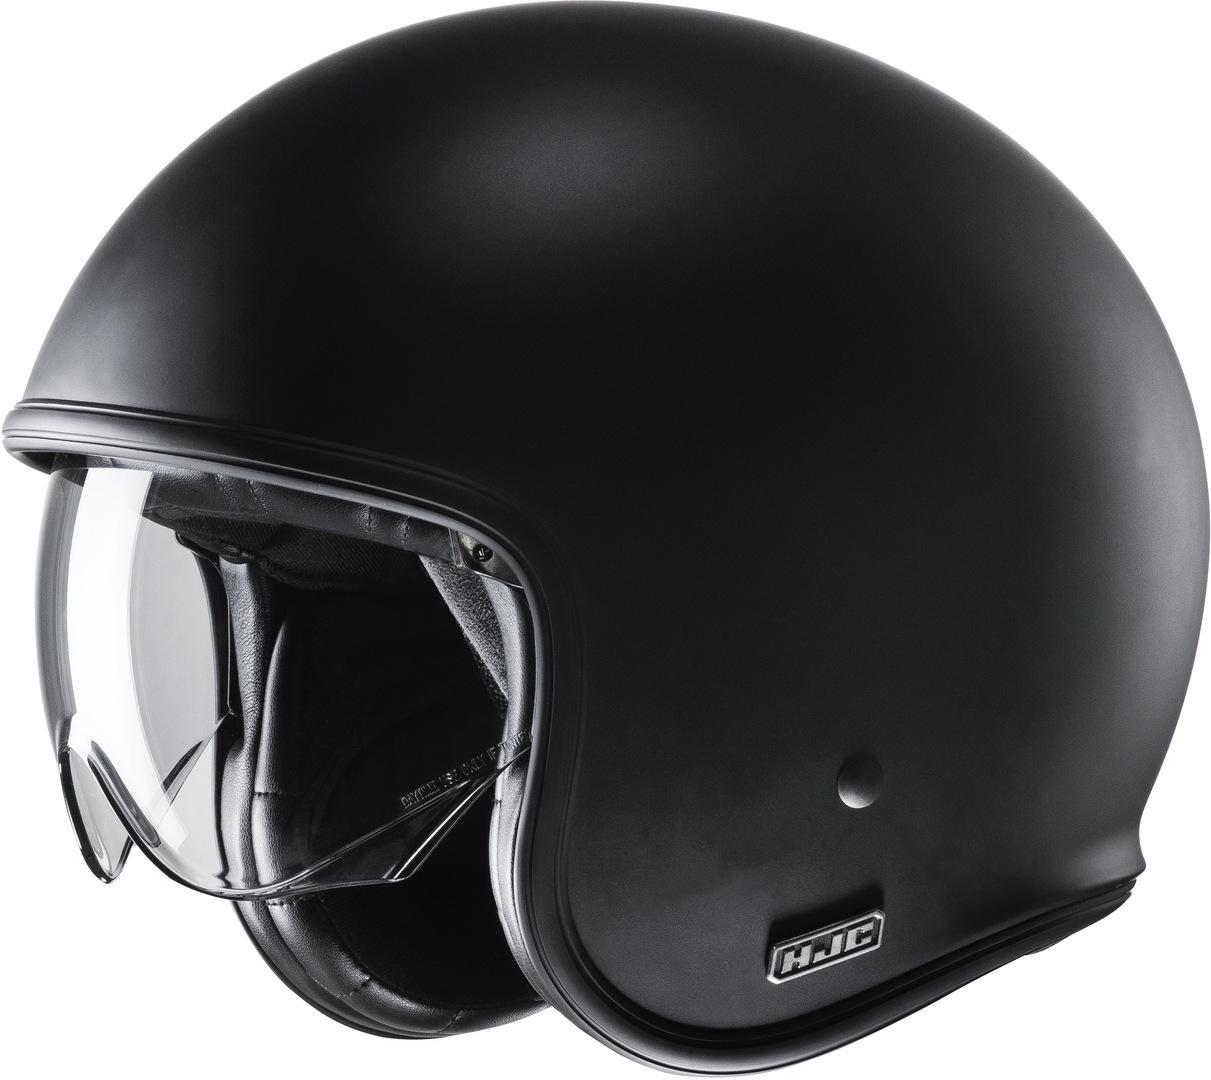 HJC V30 Jethelm, schwarz, Größe S, schwarz, Größe S